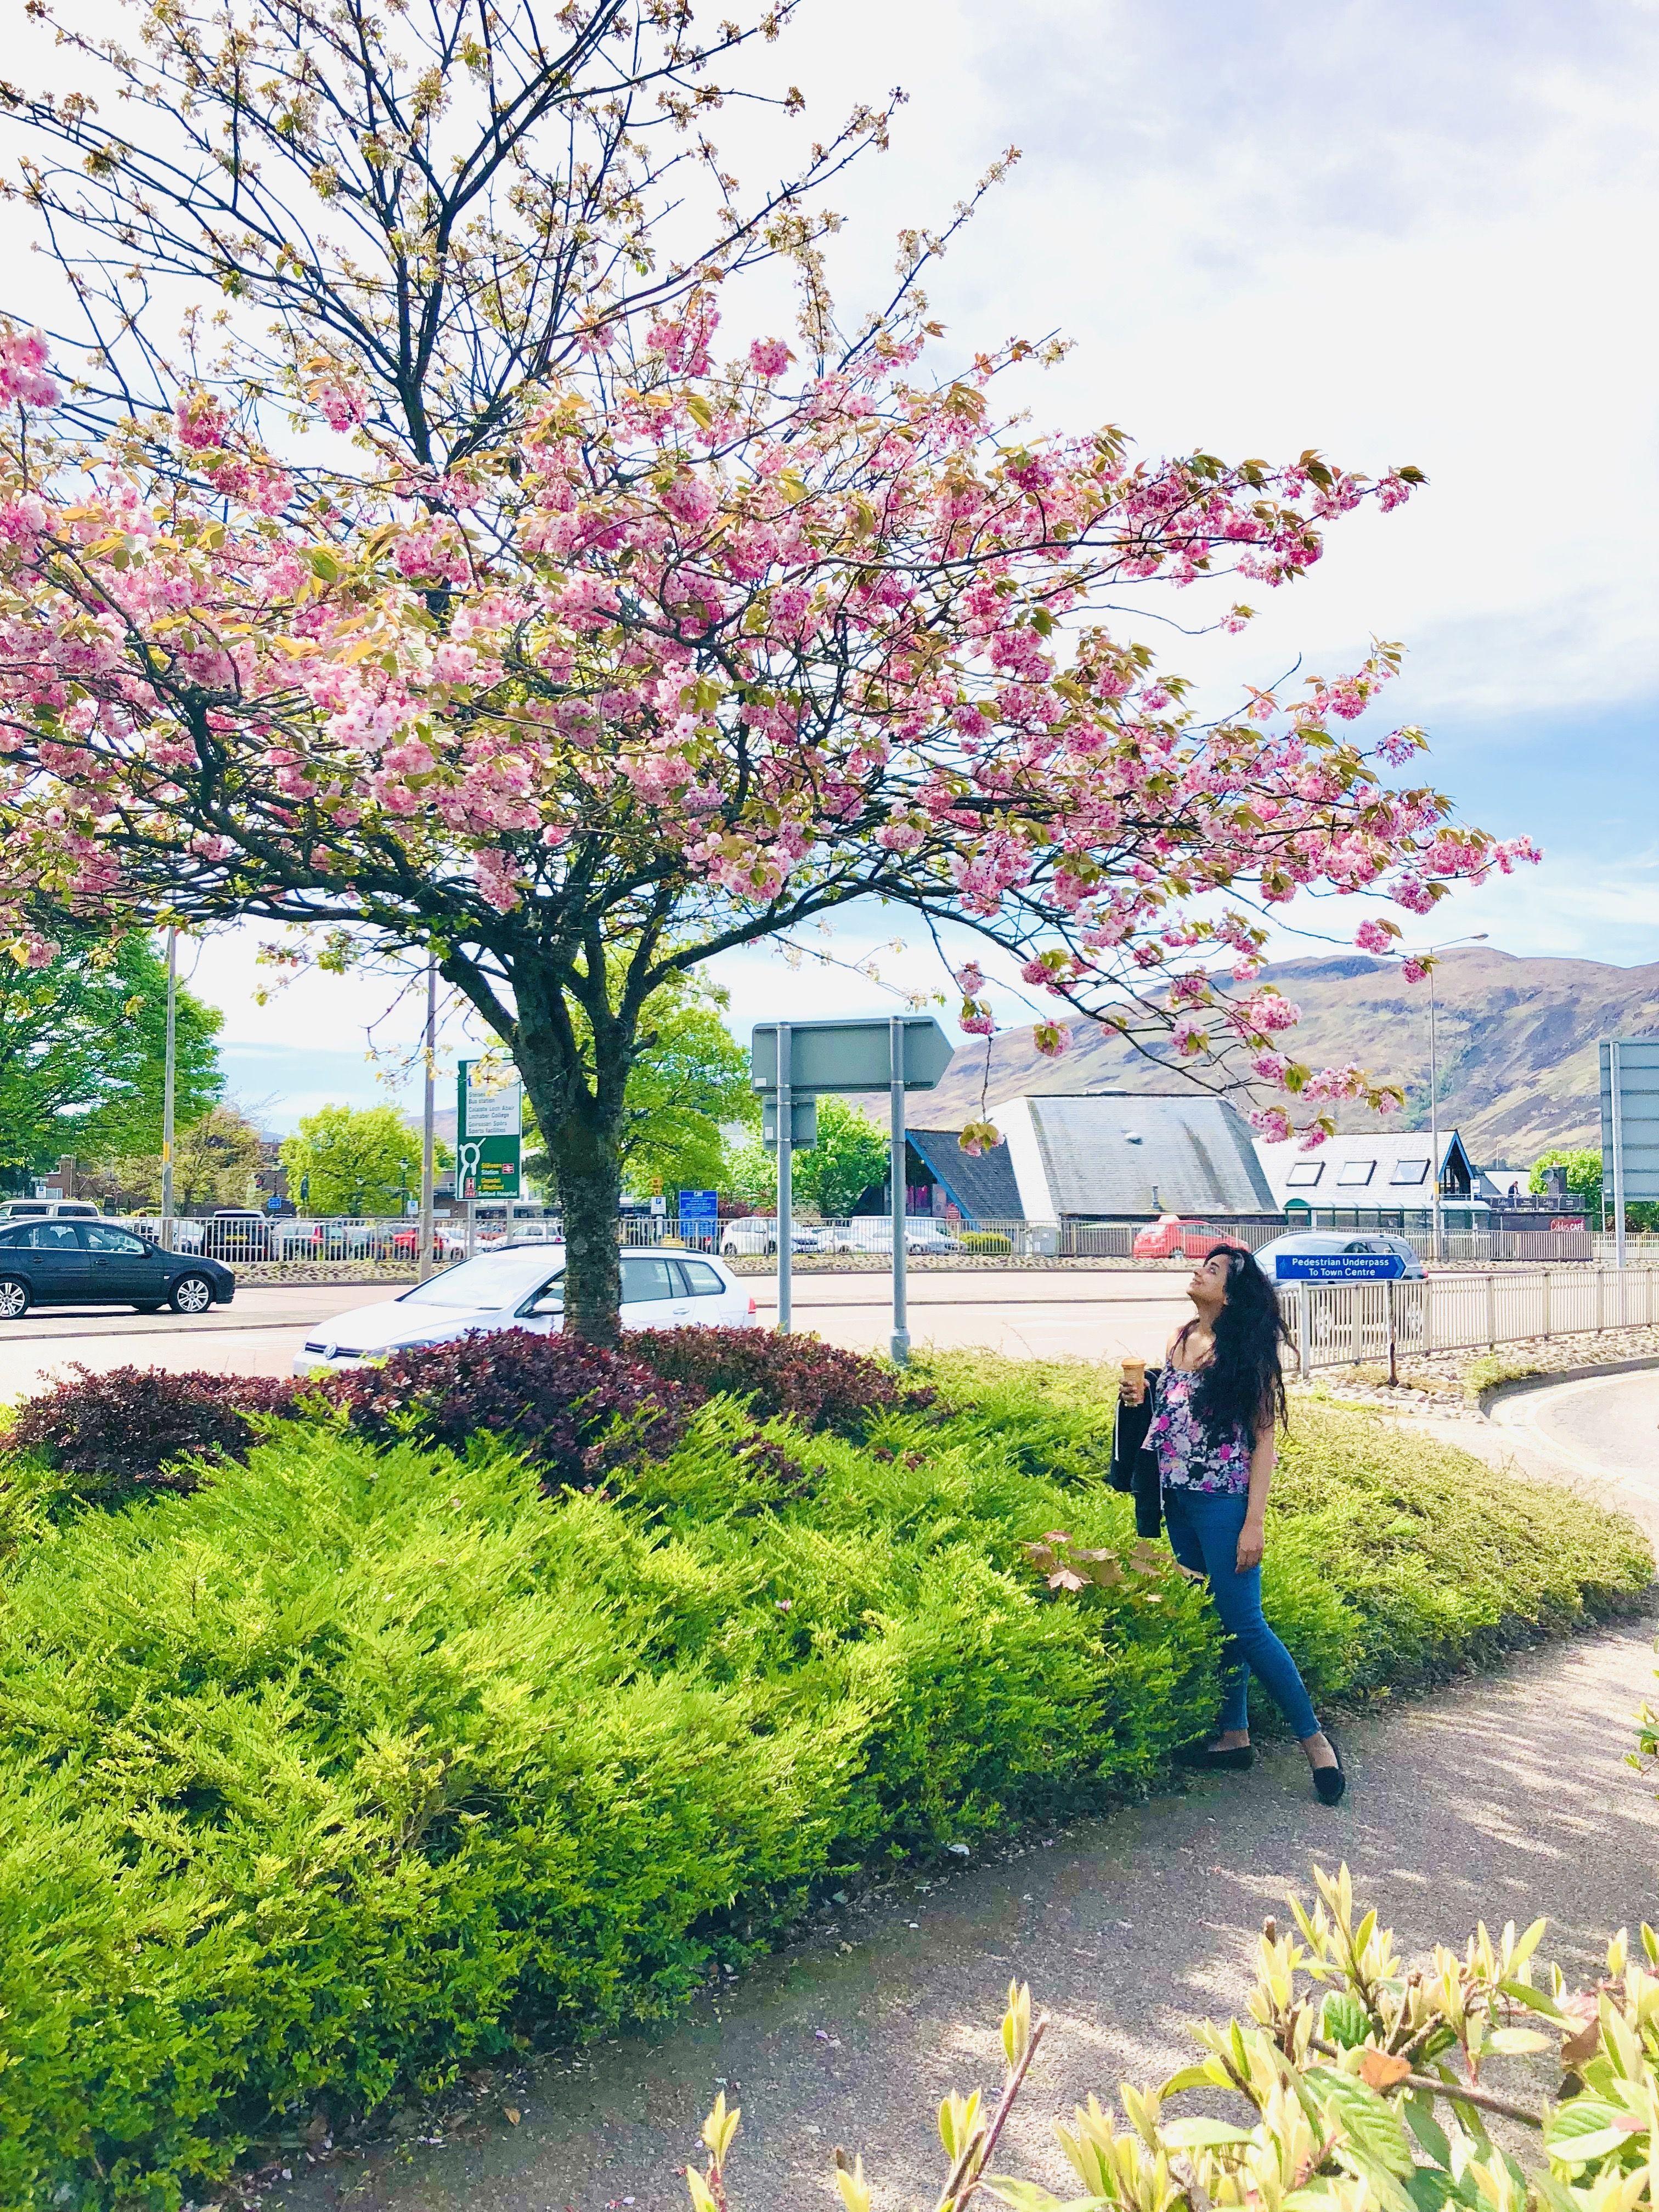 #cherryblossom #PinkFlowers #FlowerLover #indiantraveller #photooftheday #weekendvibes #photoshare_everything #Summerishere #Longhair #sheisnotlost #IndianBlogger #Lonelyplanetindia #passionpassport #thetravelwomen #flowerphotography #scotlandsbeauty #scotland_greatshots #Scottish #treesarelife #naturelovers #flowerstagram #cherryblossomtree #Dreamy #ootd #Sunshine #bluesky #cloudyday #Highlands #igflowers #femmetravel